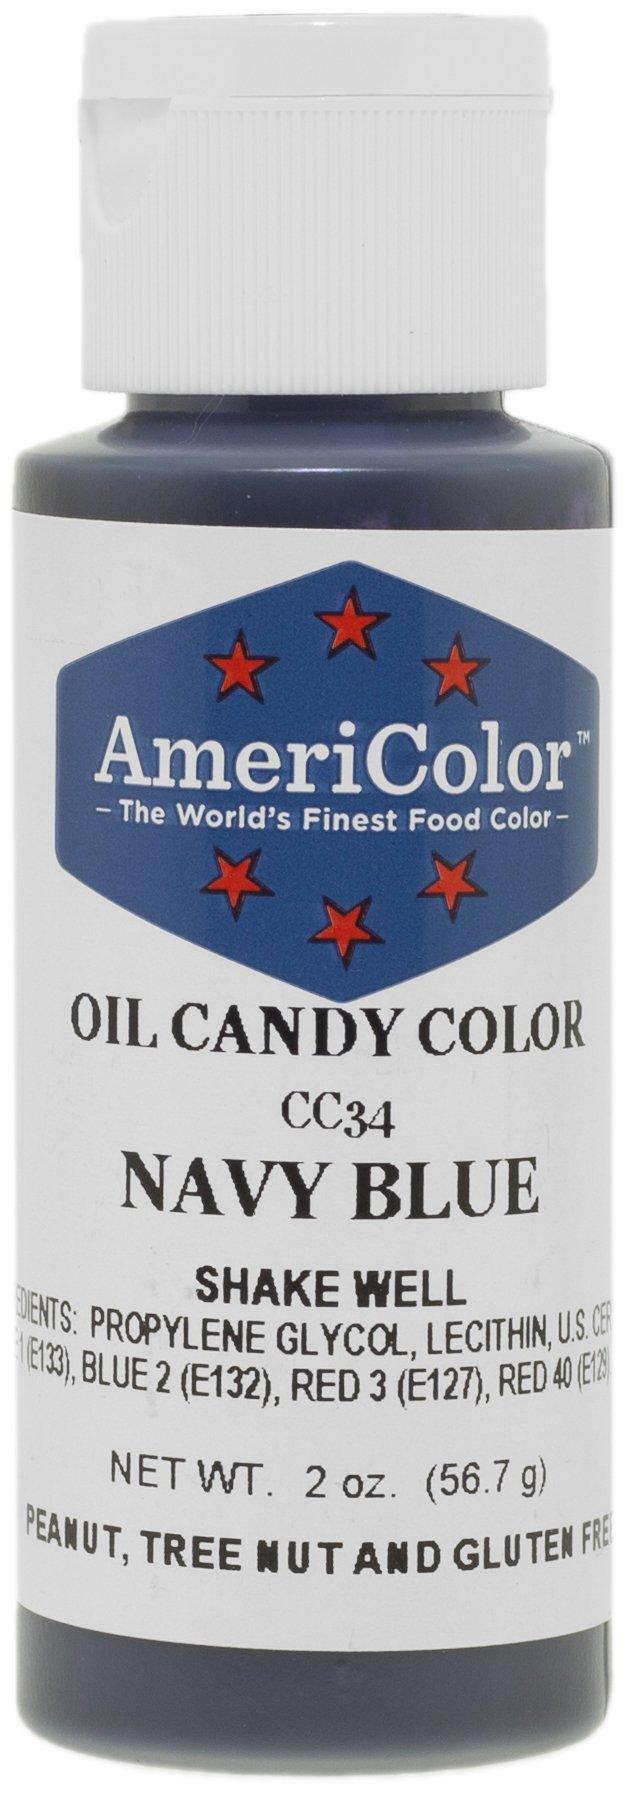 AmeriColor 2 oz Navy Blue Oil Candy Color